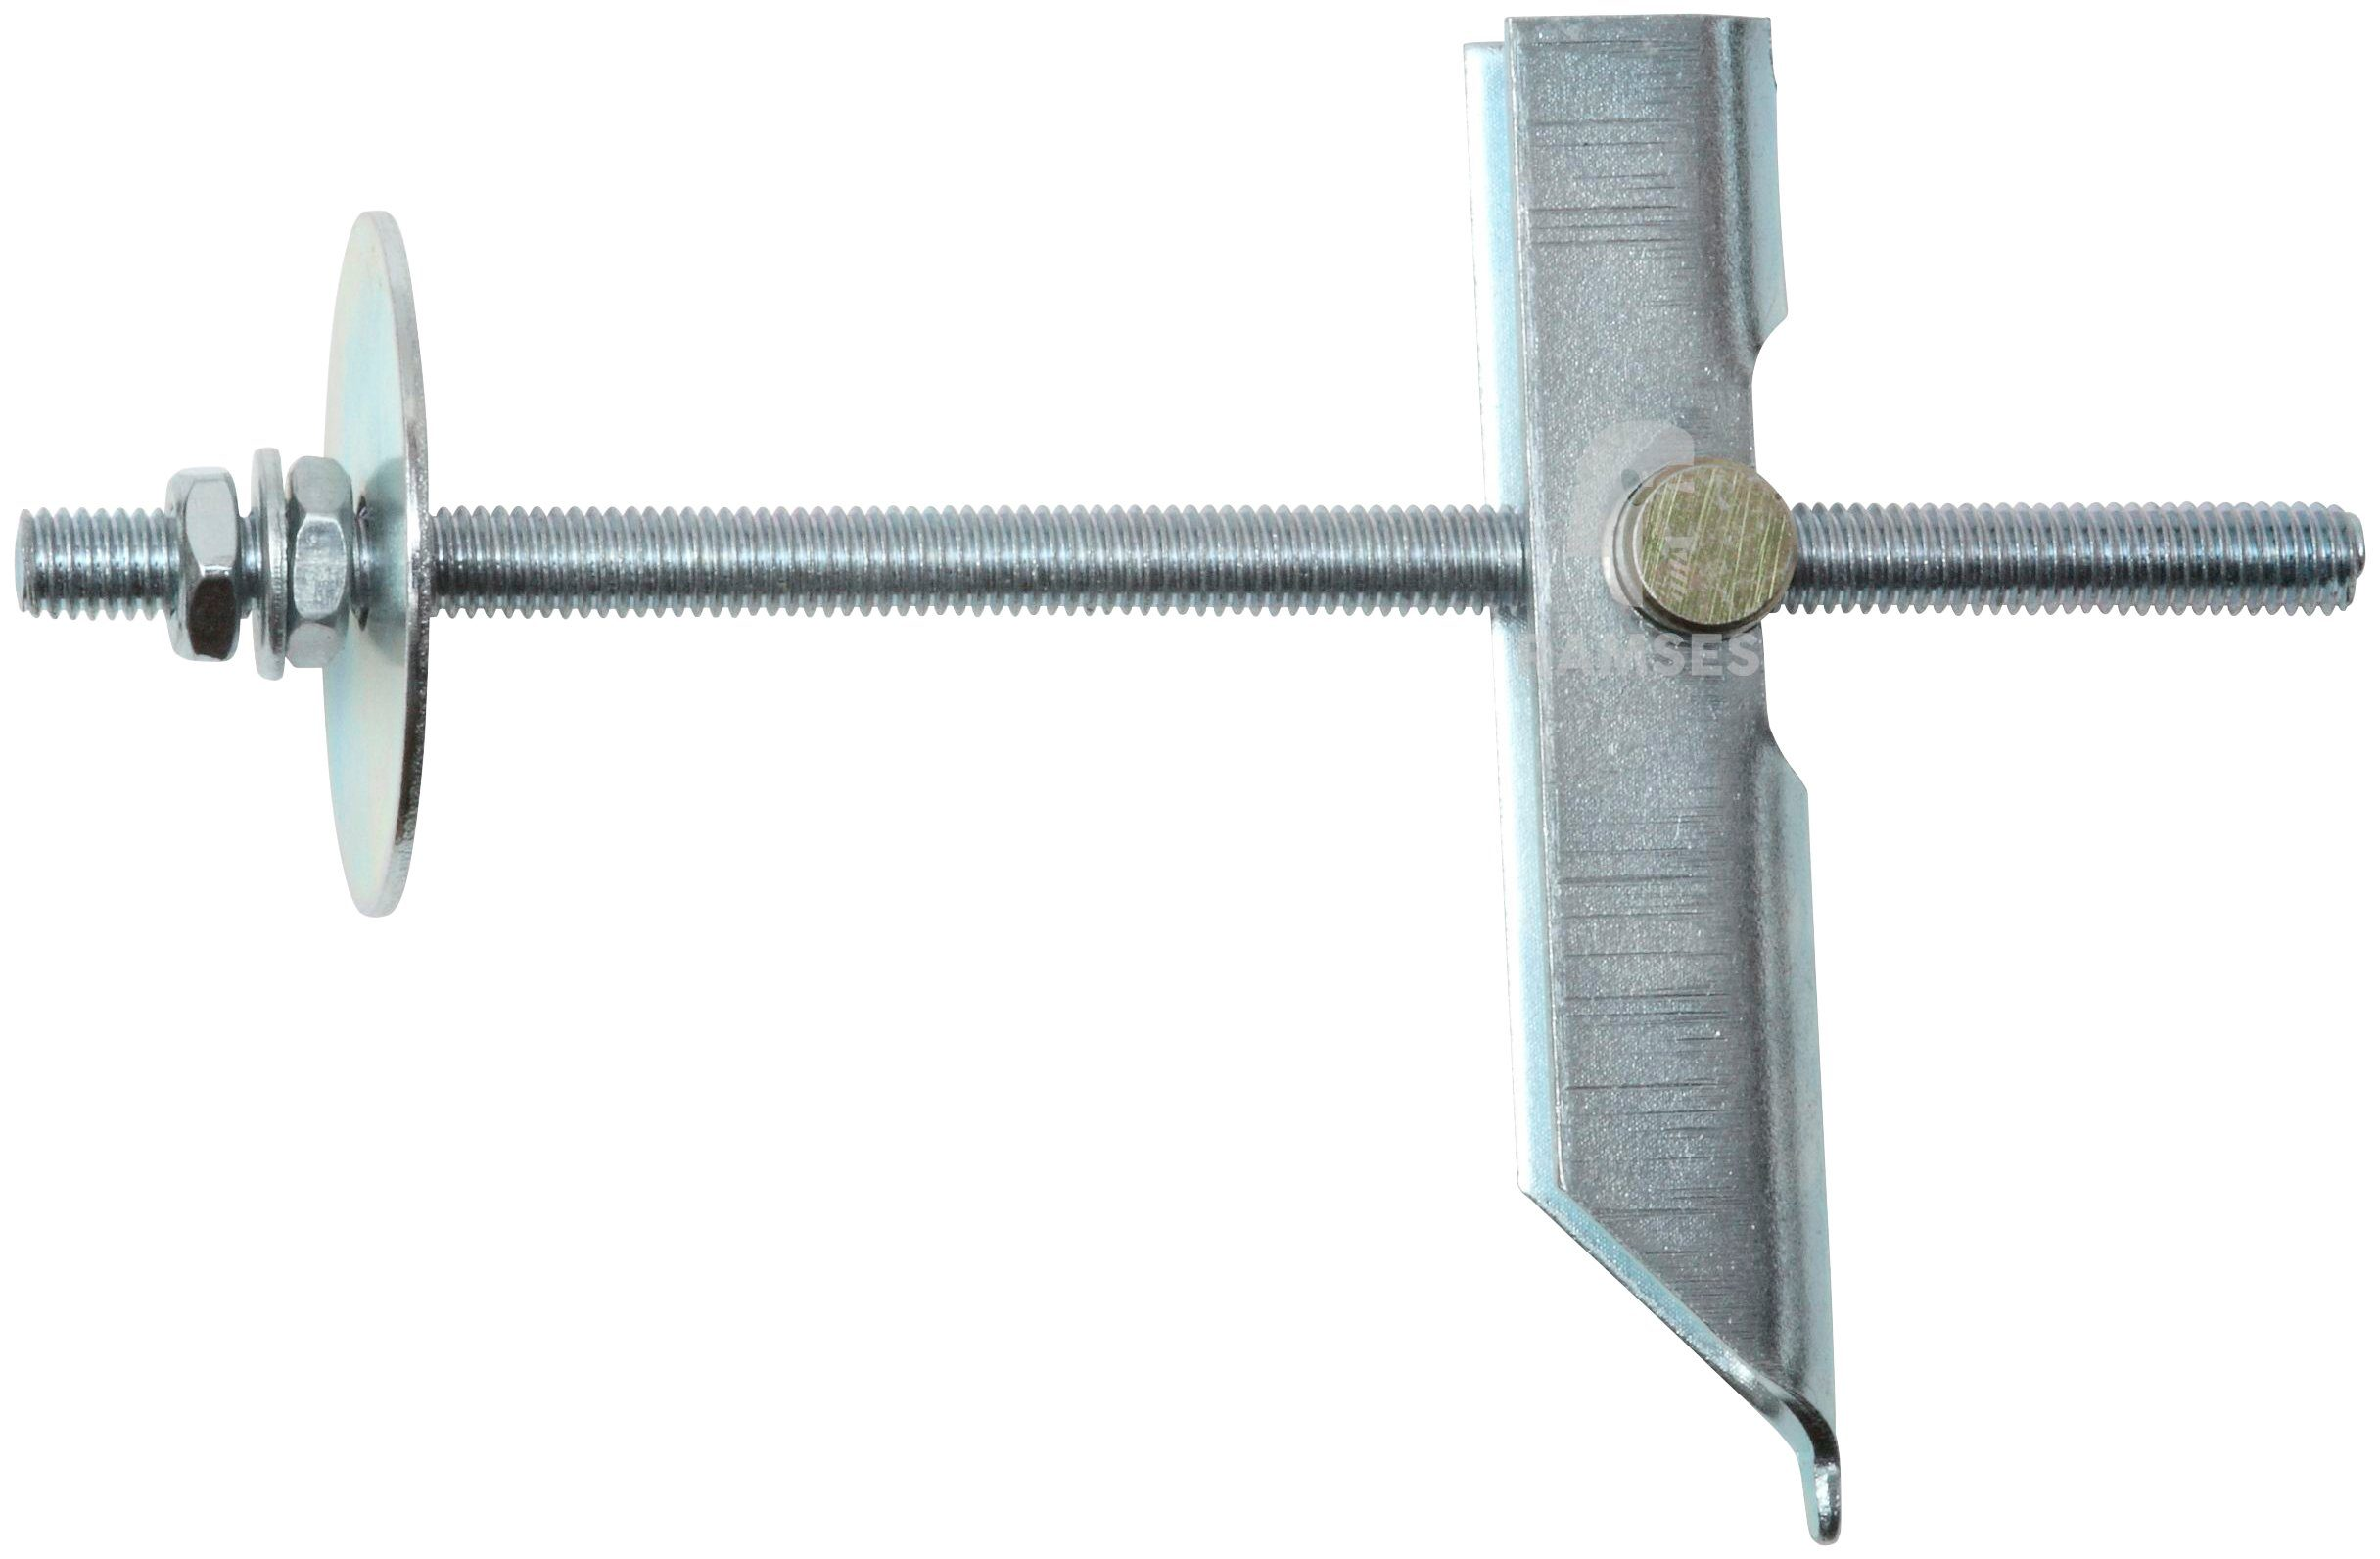 RAMSES Dübel , Kippdübel mit Haken M5 x 100 mm, 50 Stück